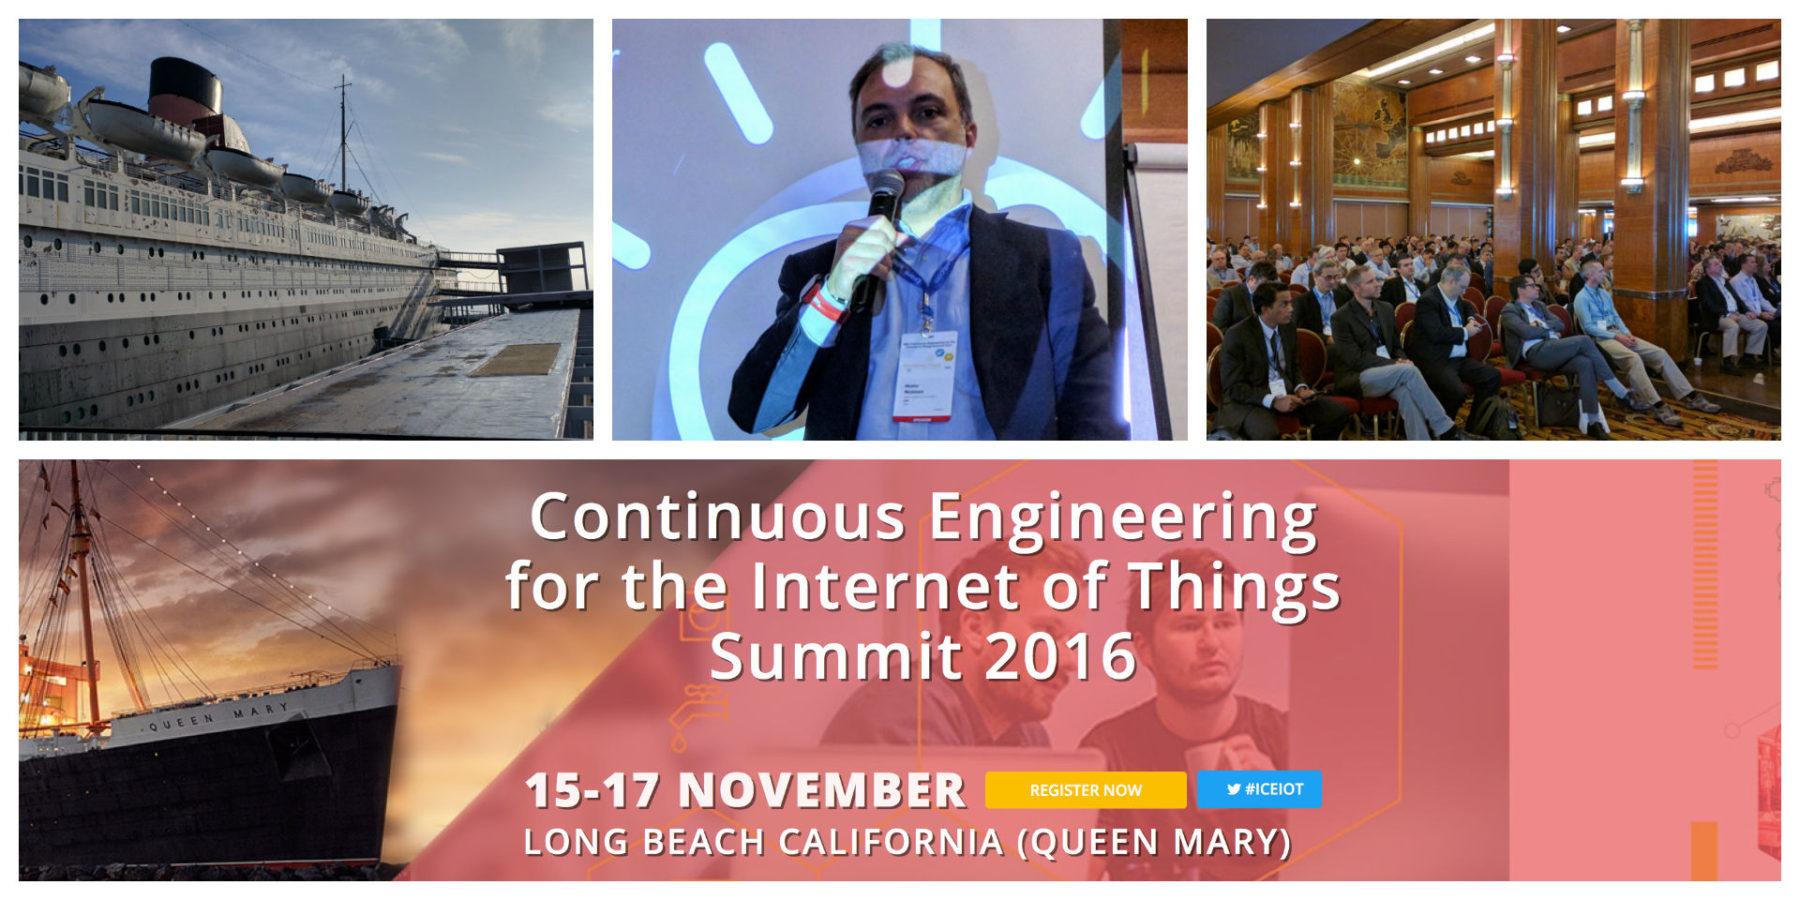 Internet of Things Summit 2016